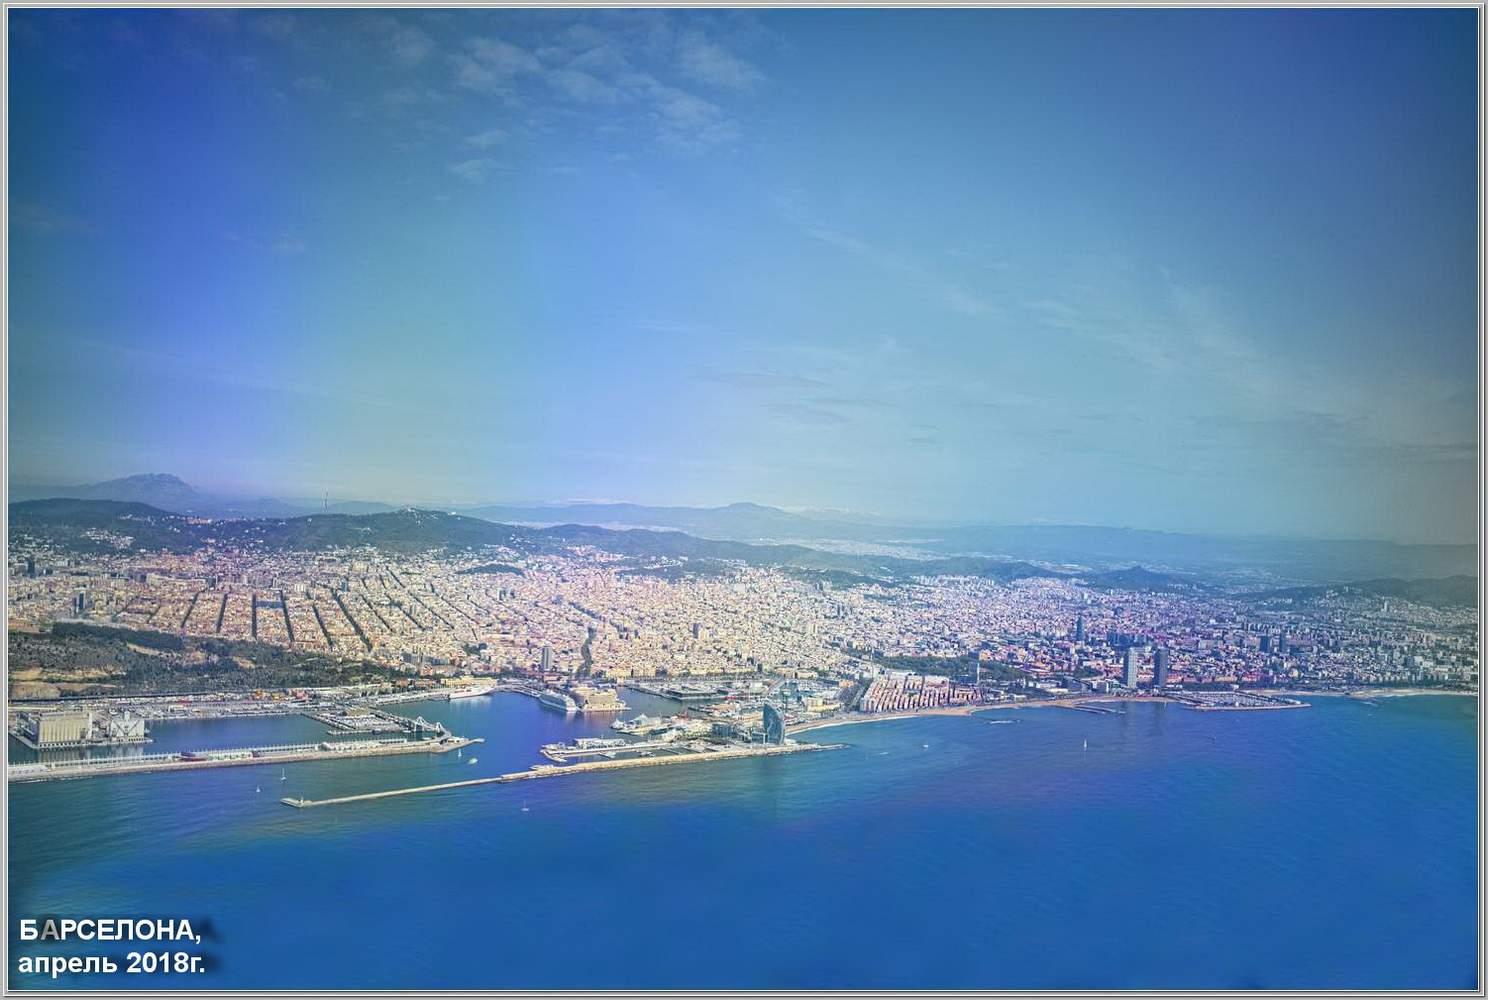 1. Барселона. Прибытие_001